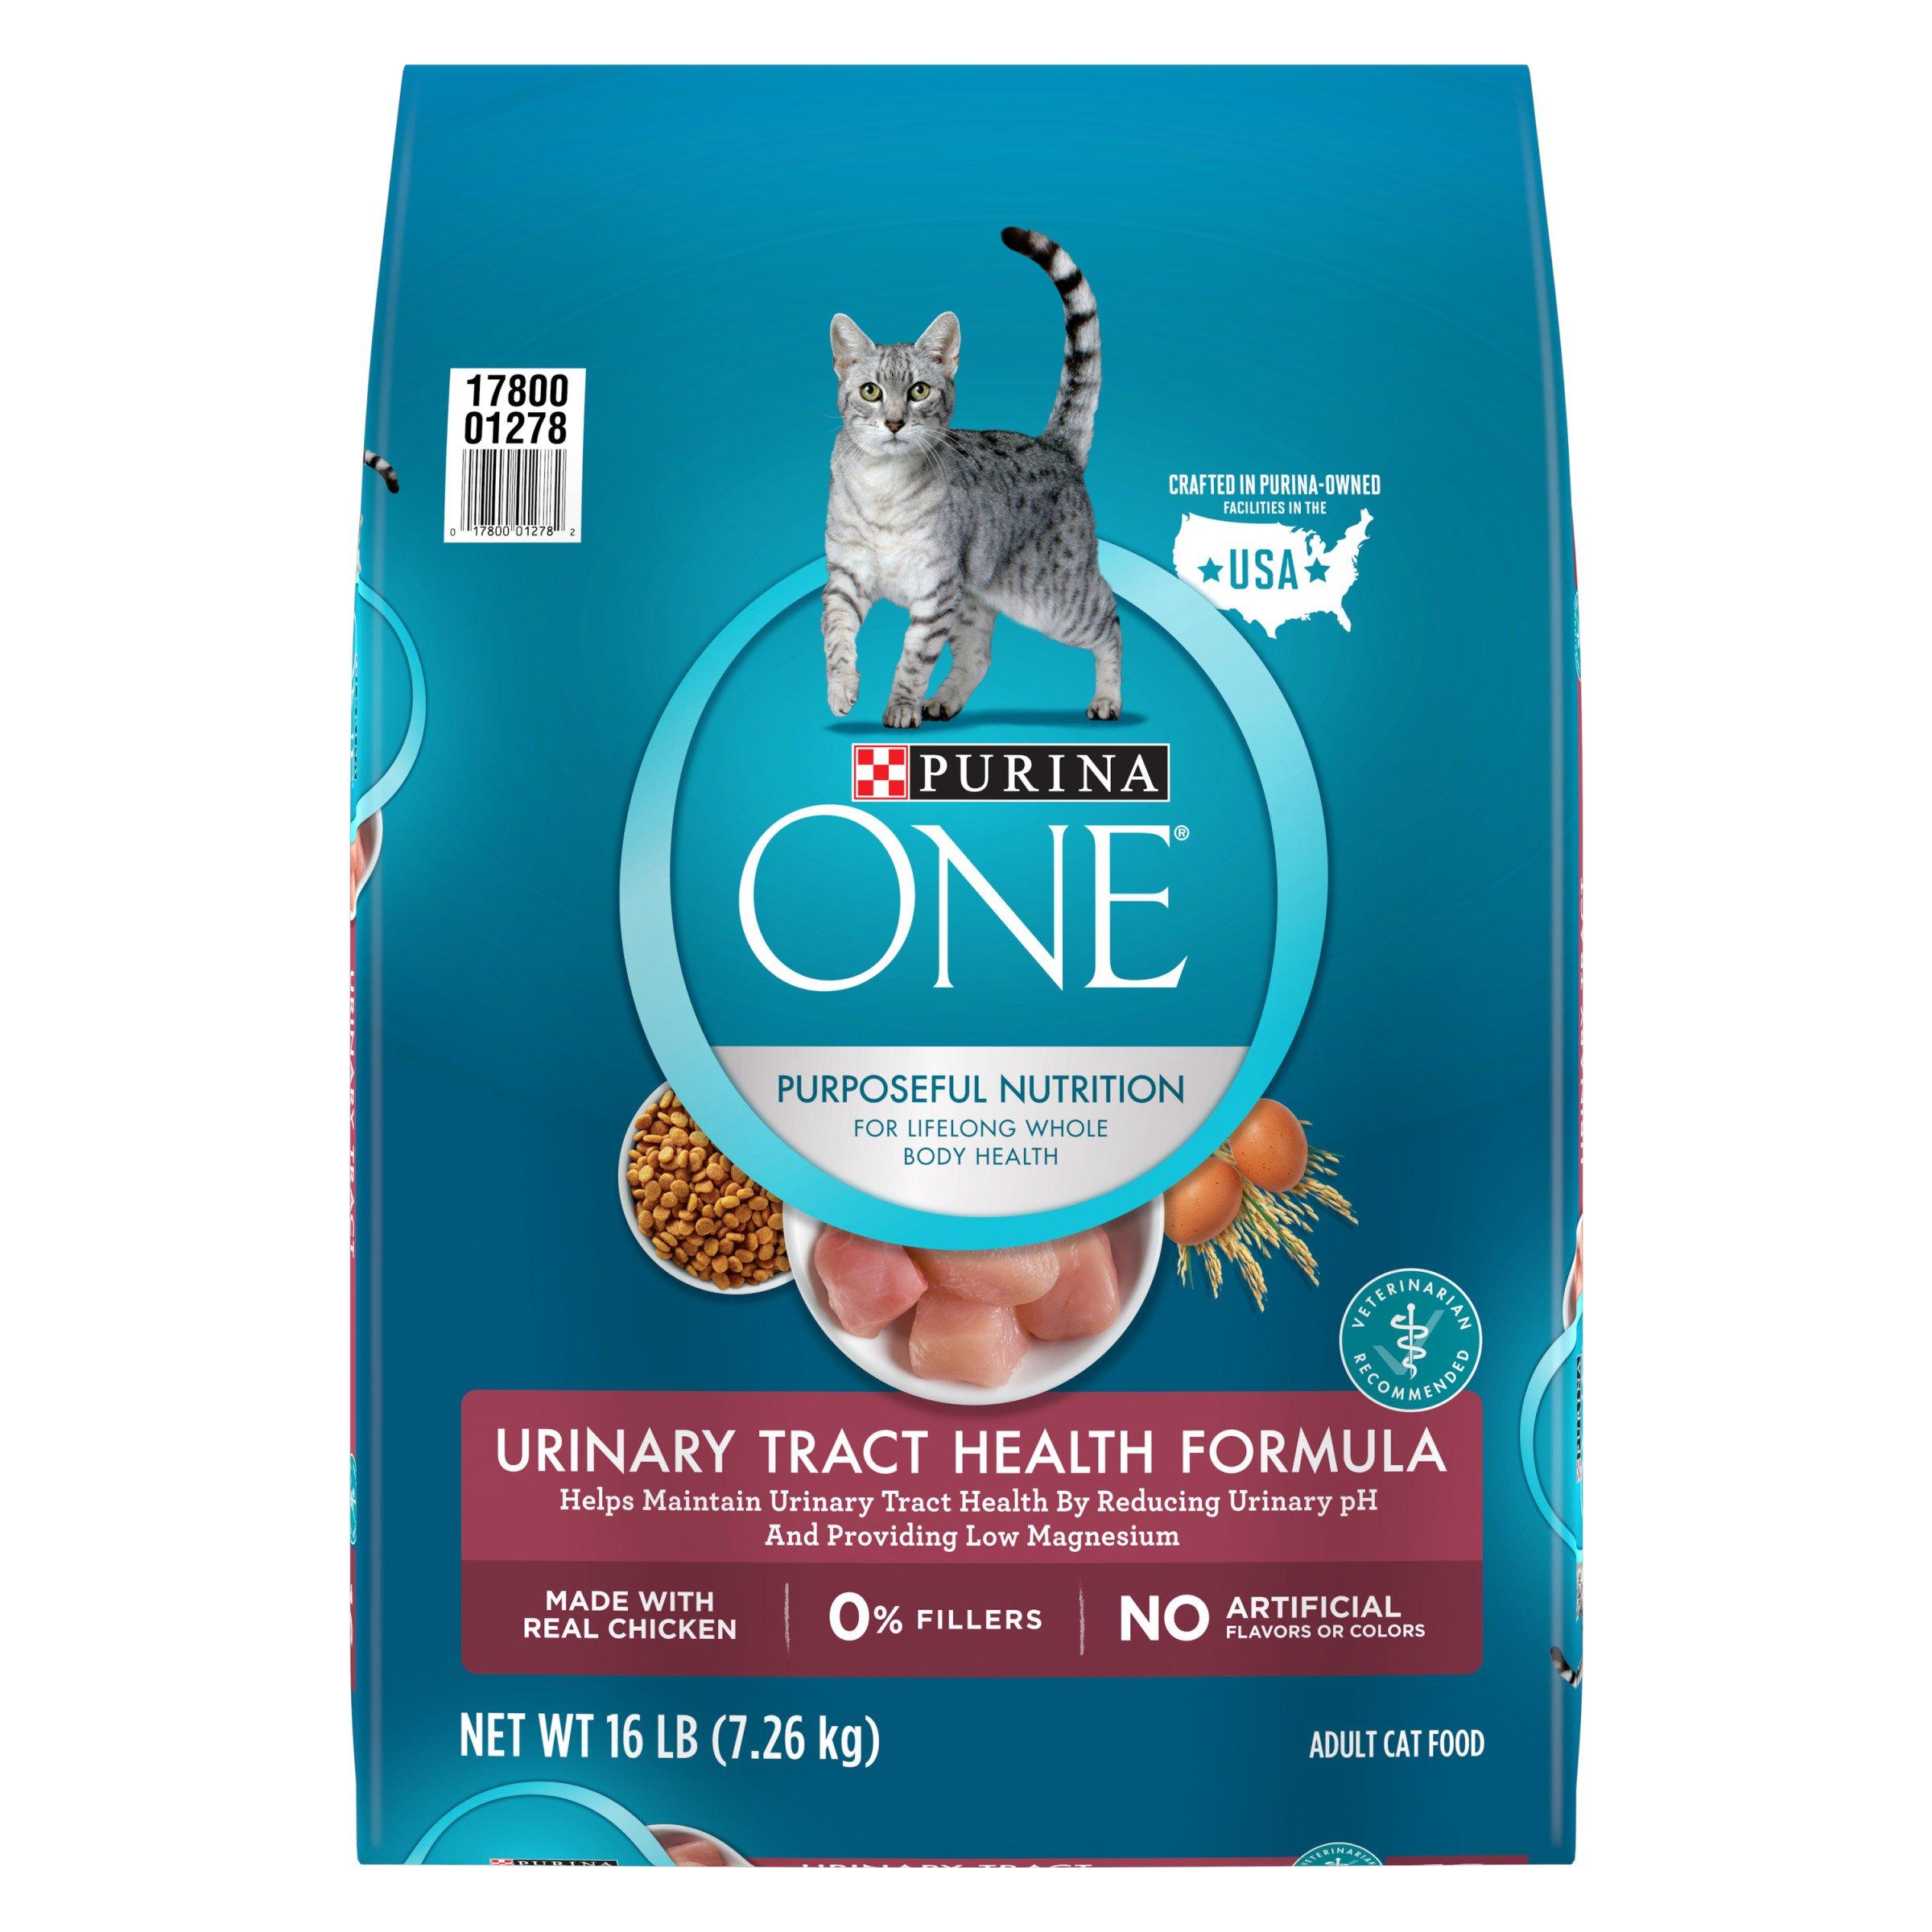 Purina ONE Urinary Tract Health Formula Adult Dry Cat Food - 16 lb. Bag